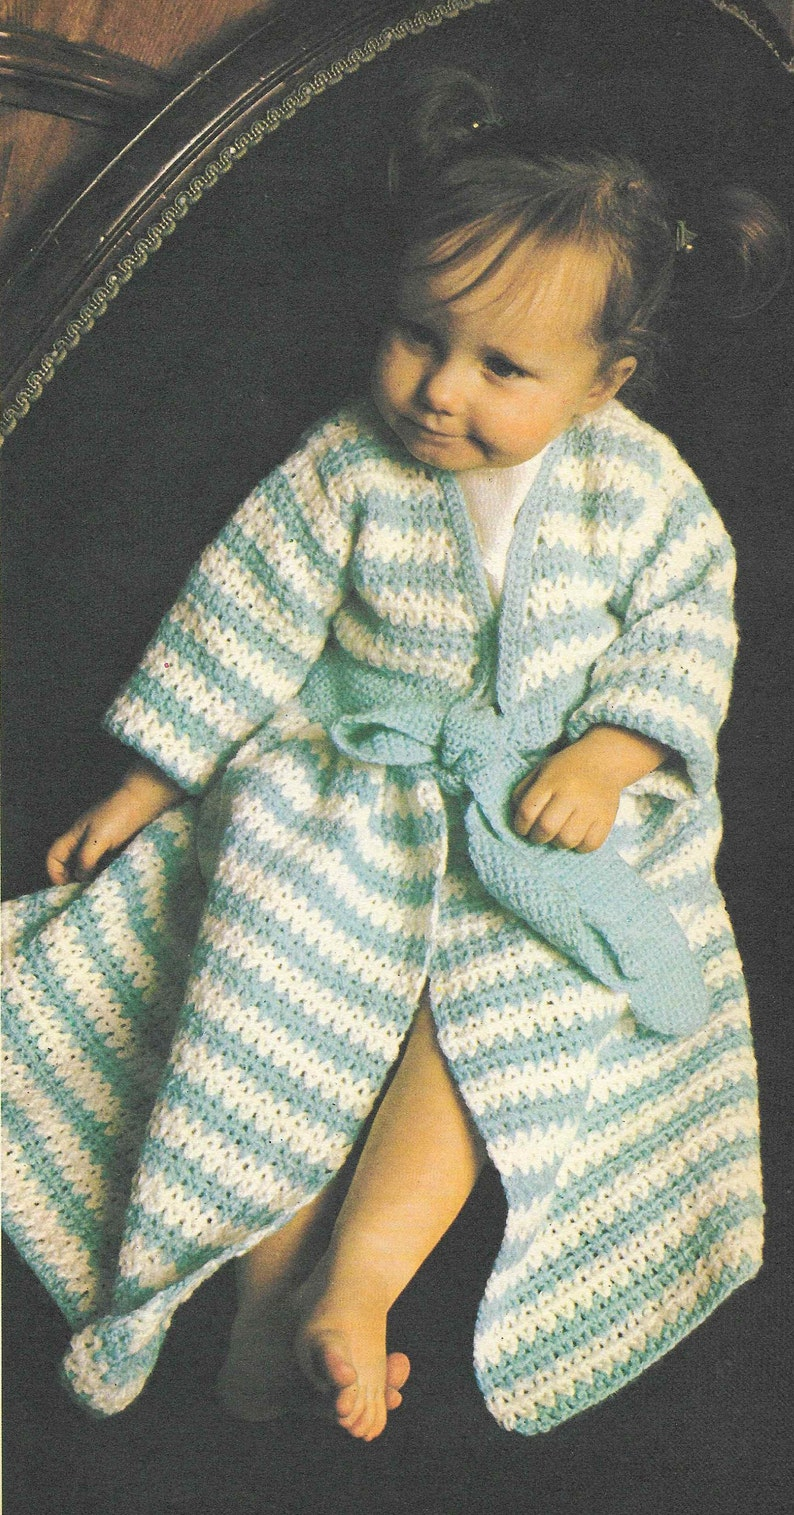 10 x Baby CROCHET PATTERN Crochet Dress Hat Cardigan Toddler Vintage Crochet 16-22 inches Baby Crochet Patterns PDF instant download